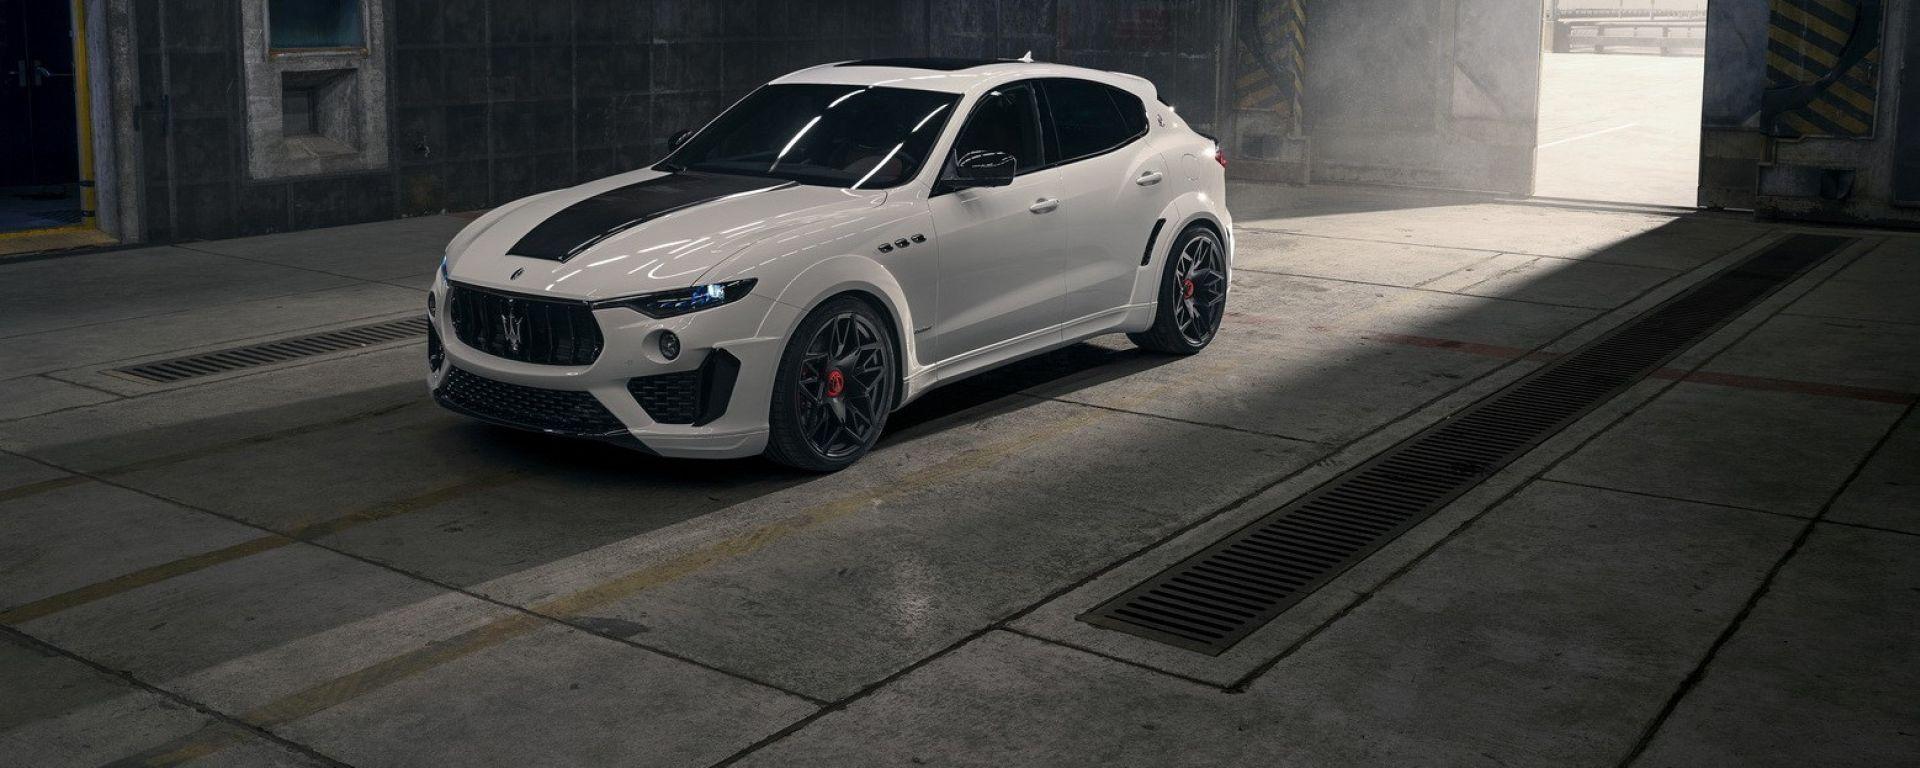 La Maserati Levante Trofeo va in palestra da Novitec